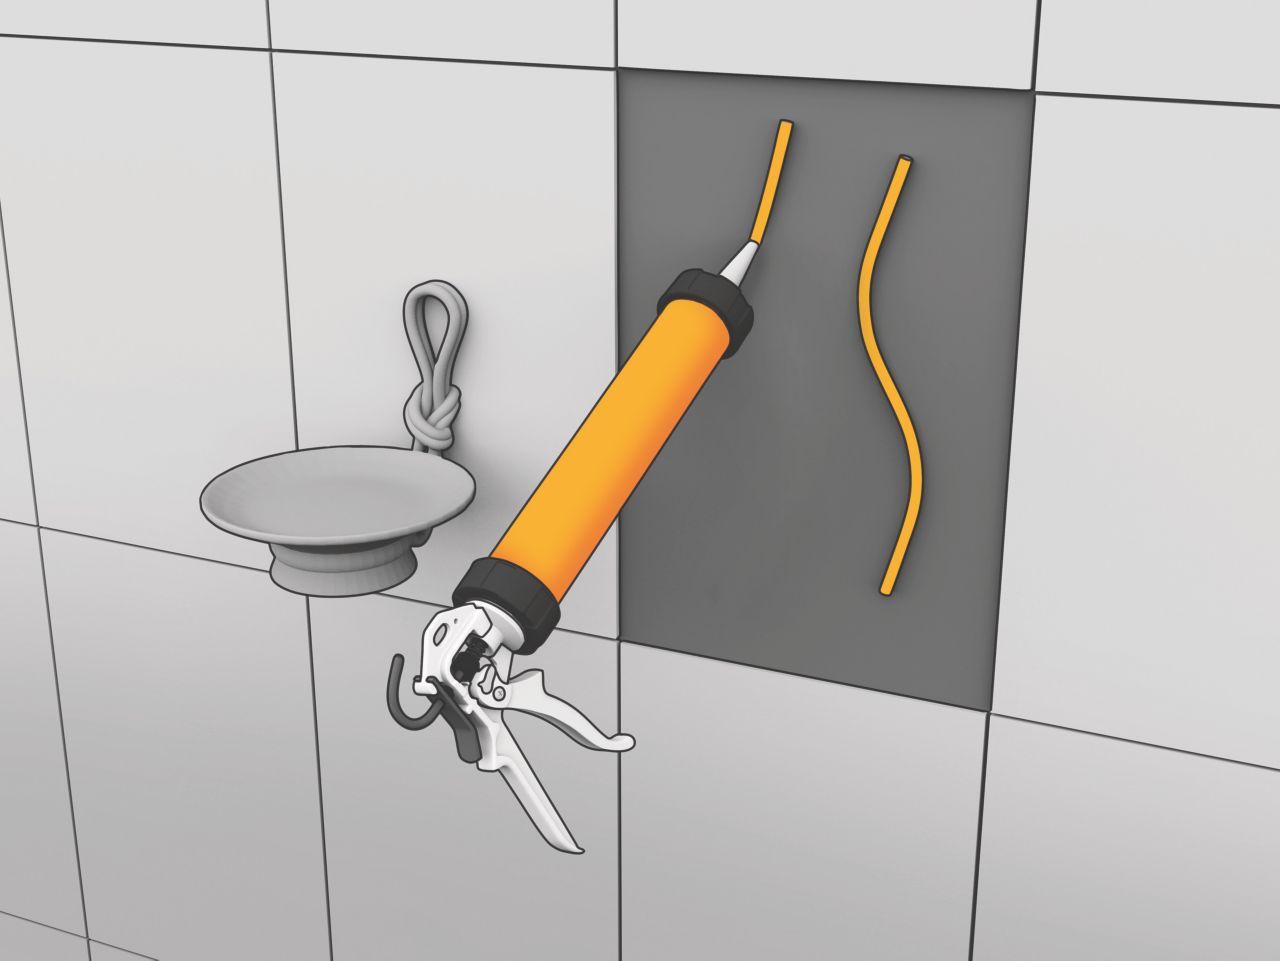 Sikaflex elastic adhesive for tiles